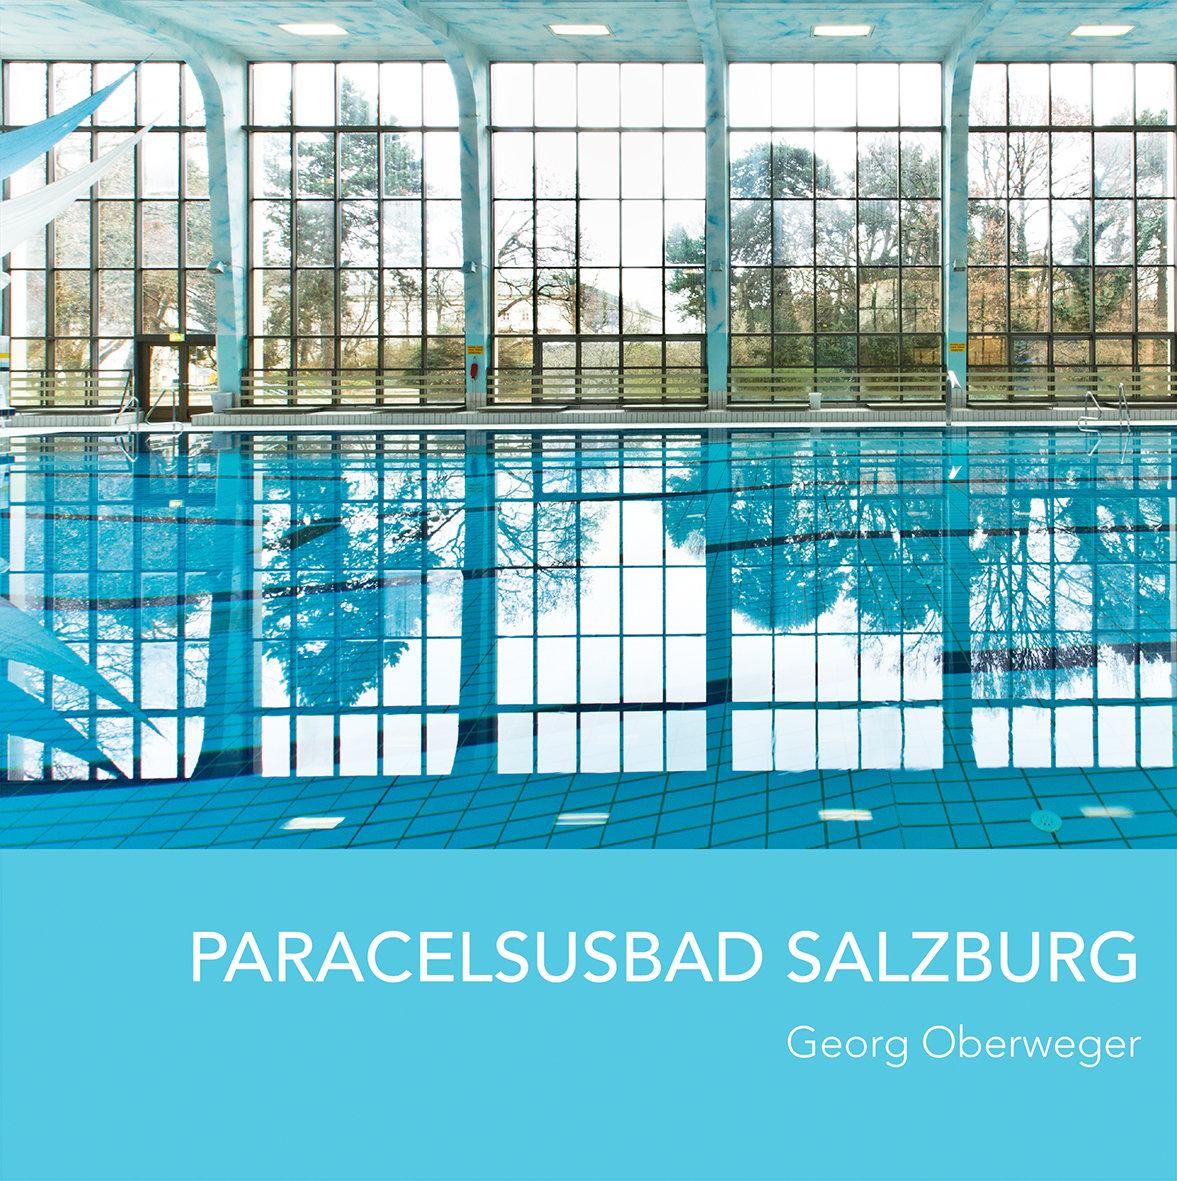 Paracelsusbad Salzburg